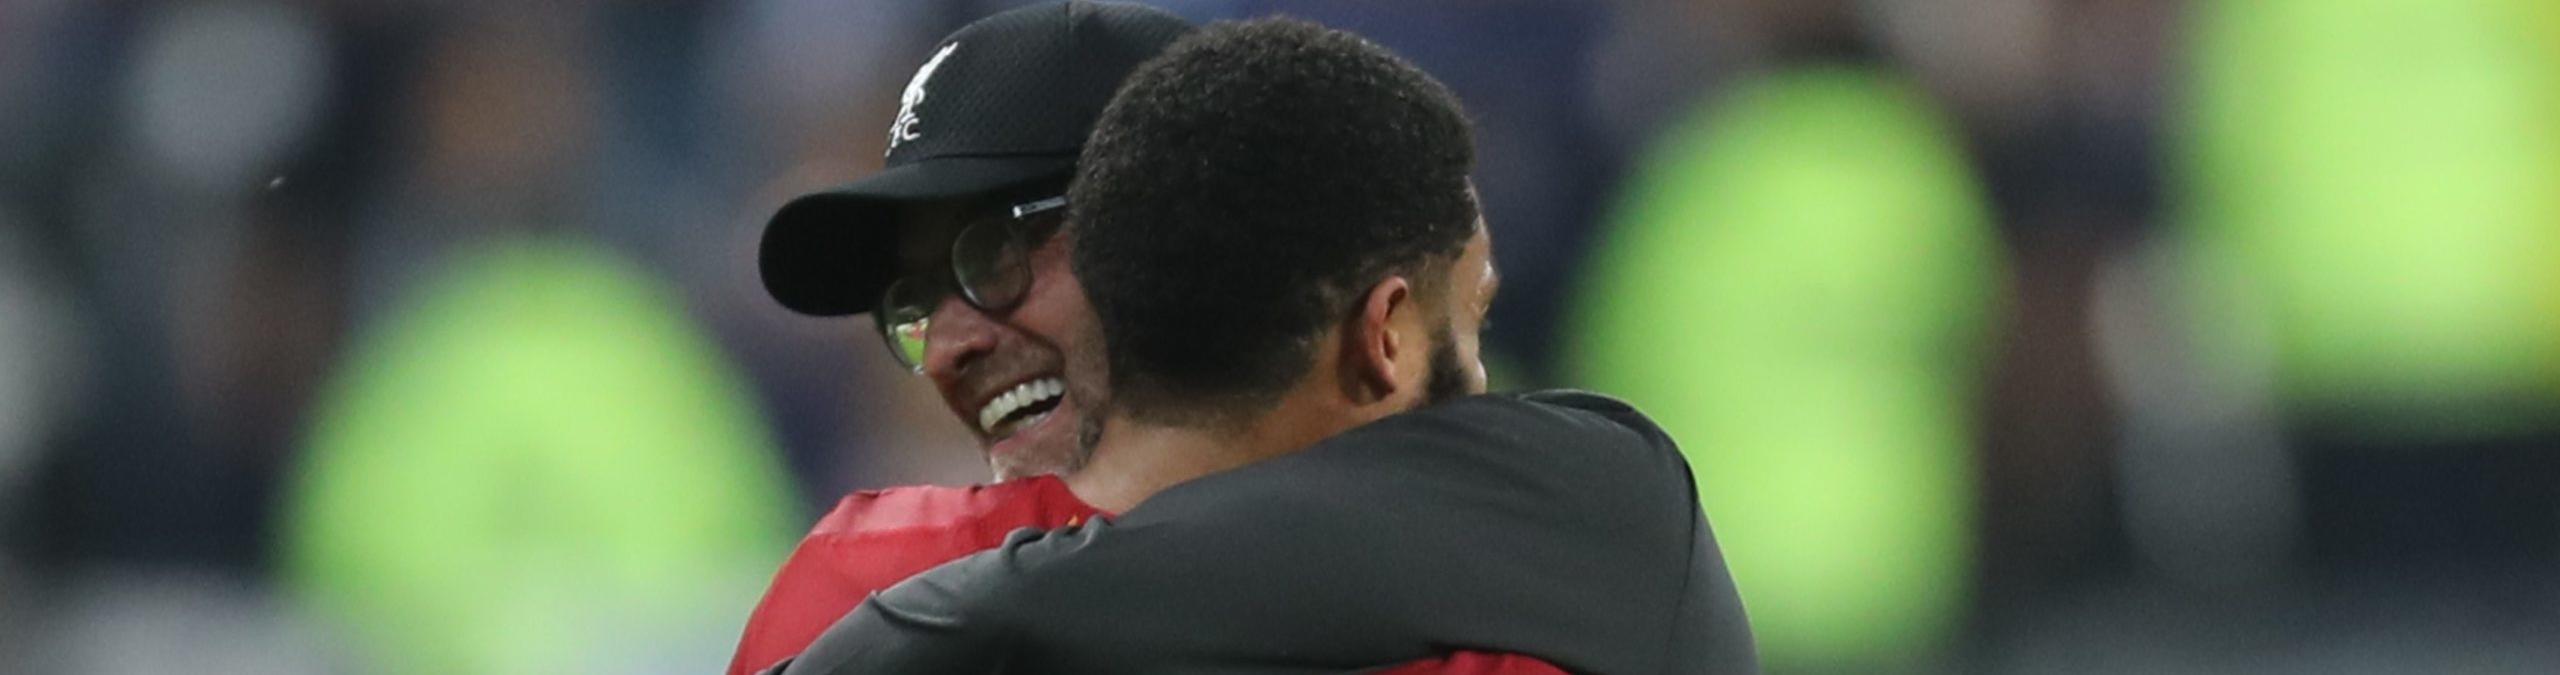 Liverpool-Flamengo, rivincita dopo 38 anni per i Reds?